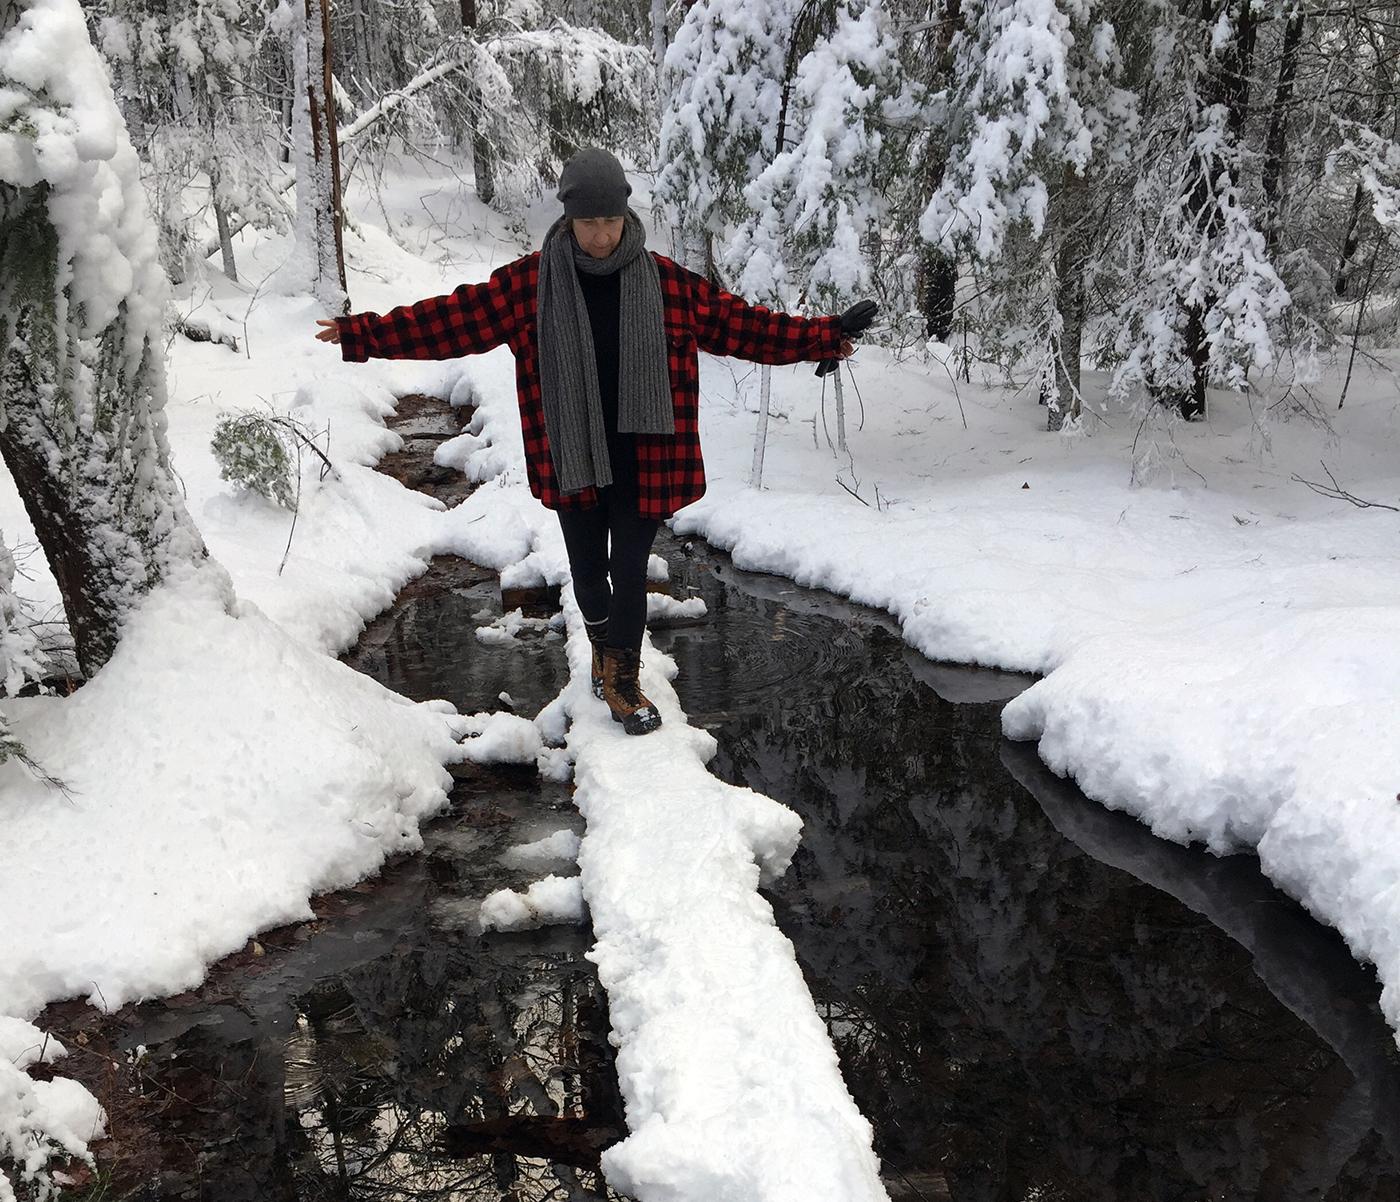 Walking in Wofles Neck Woods wearing a vintage L.L.Bean wool jacket, Freeport, Maine. Winter 2017. Photo by my husband, Michael Galanos.